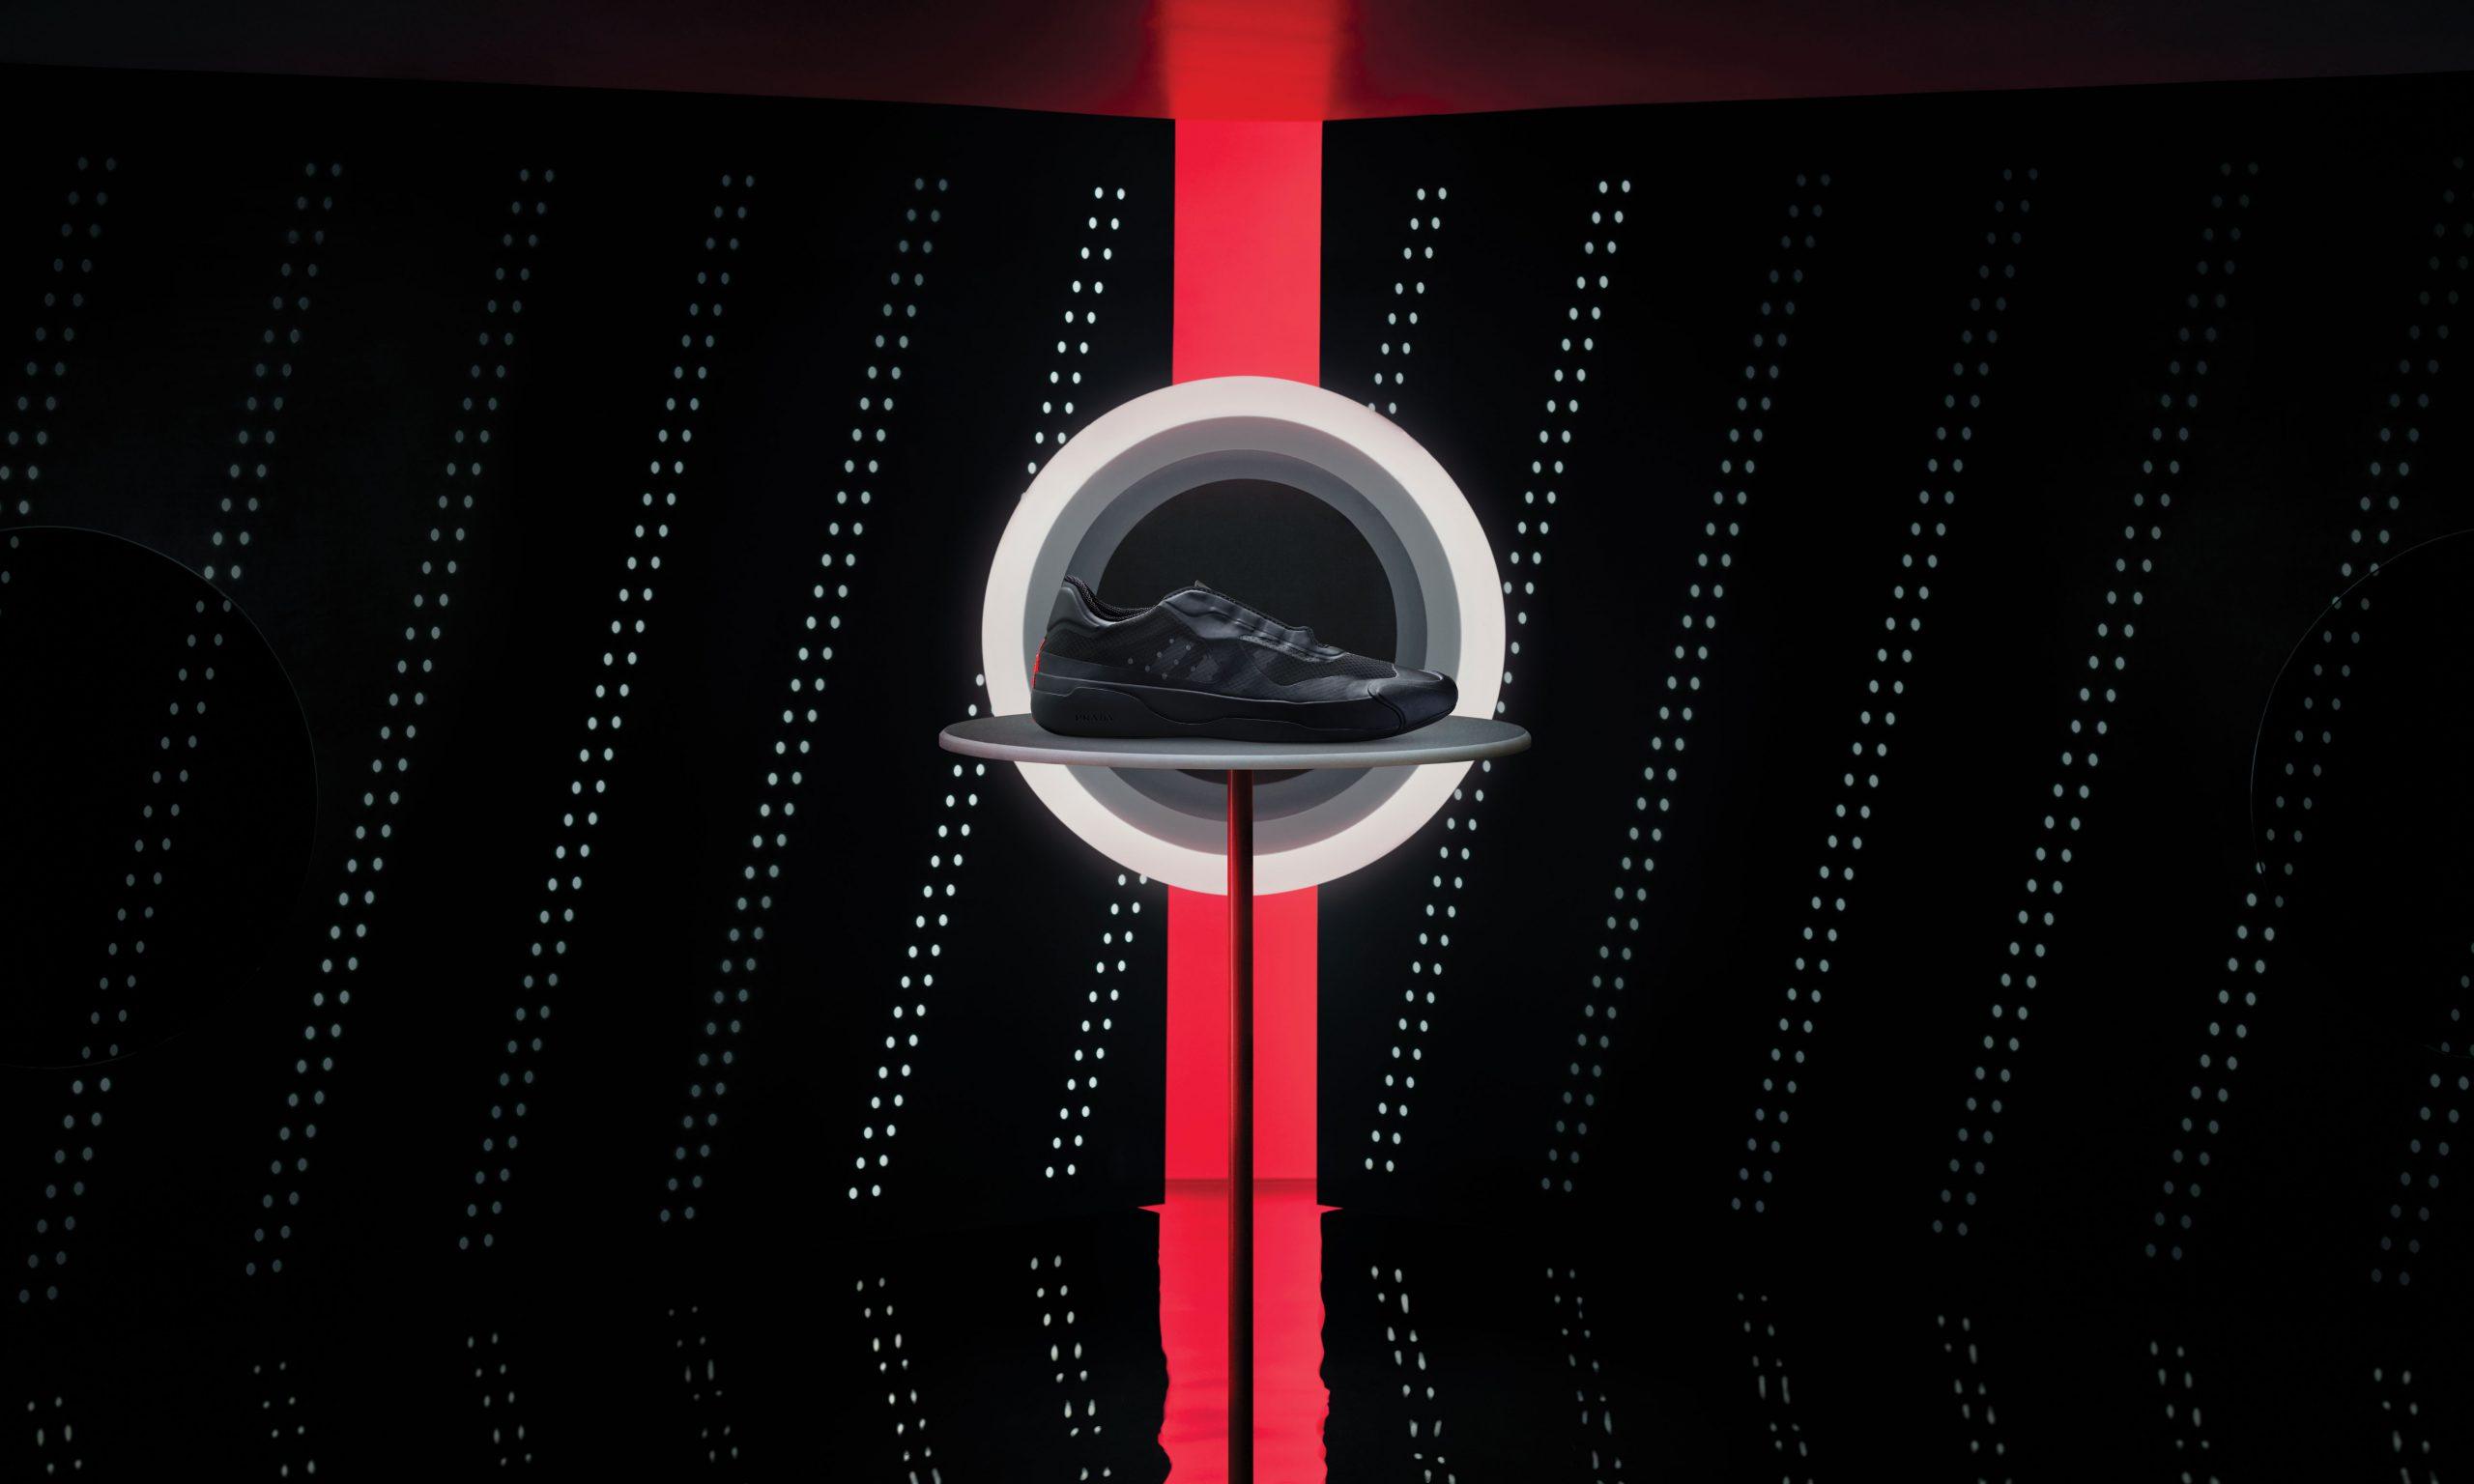 adidas 联手 PRADA 推出 A+P LUNA ROSSA 21 新配色